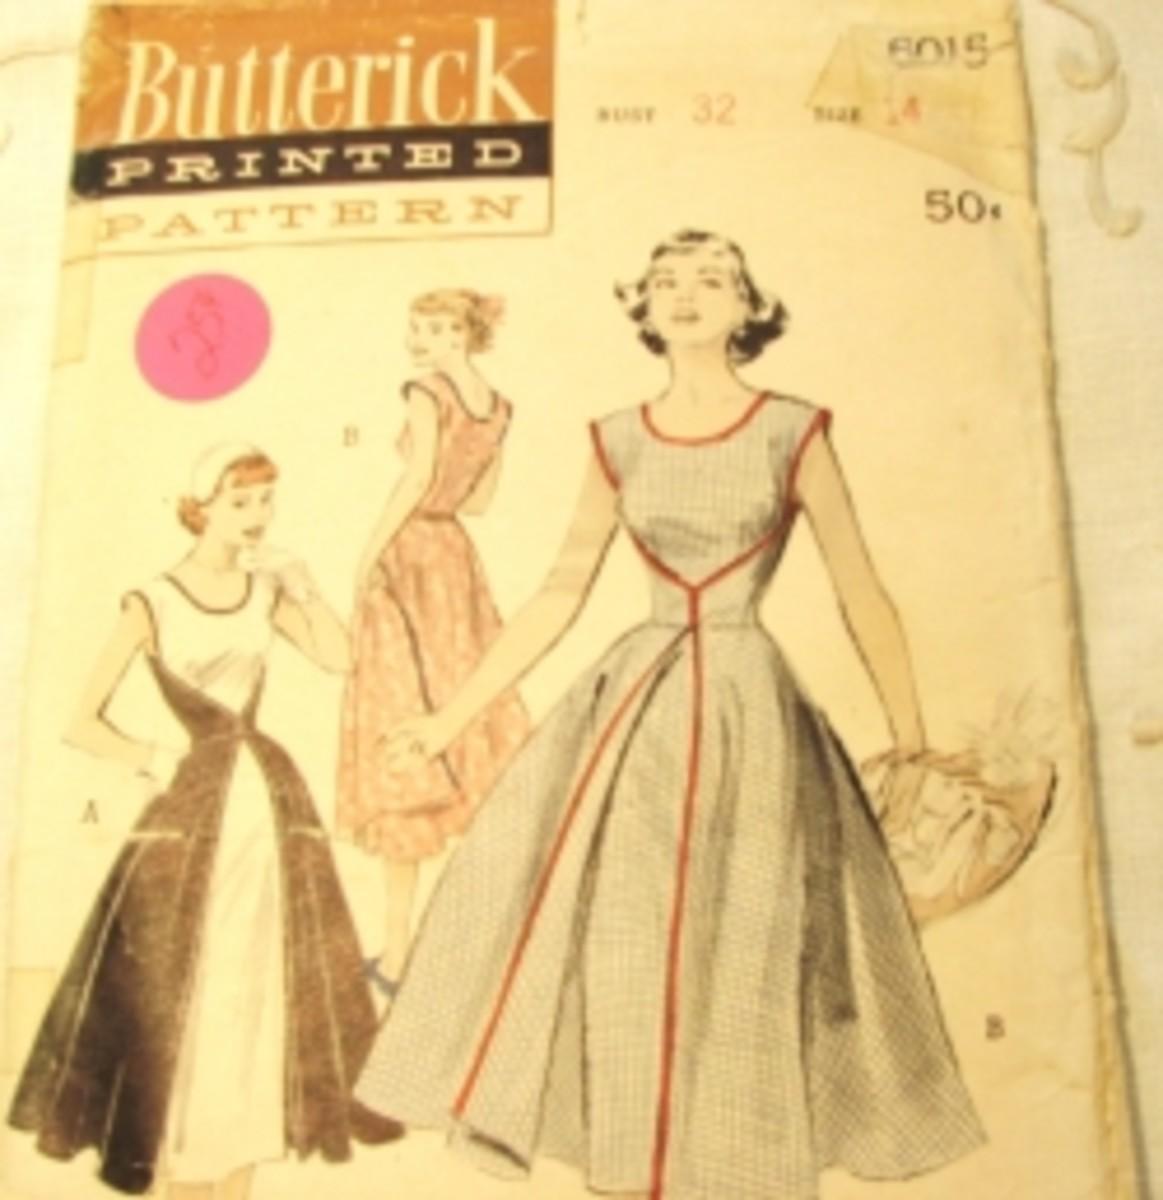 Estate sale find for .25 cents.Vintage Wrap-Around Dress